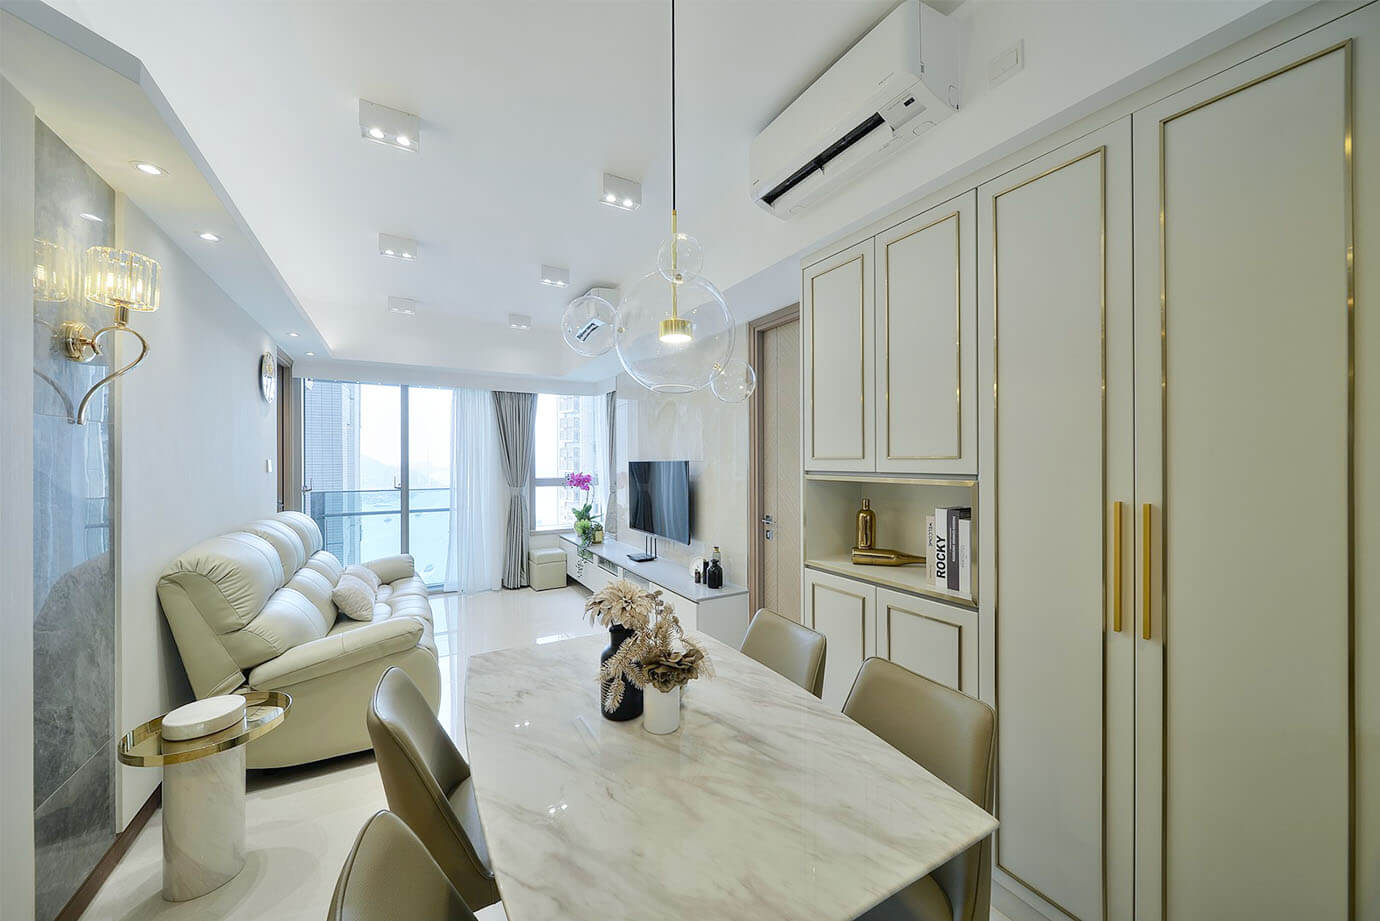 Inch Interior Design Hong Kong Ocean Supreme 海之戀 荃灣